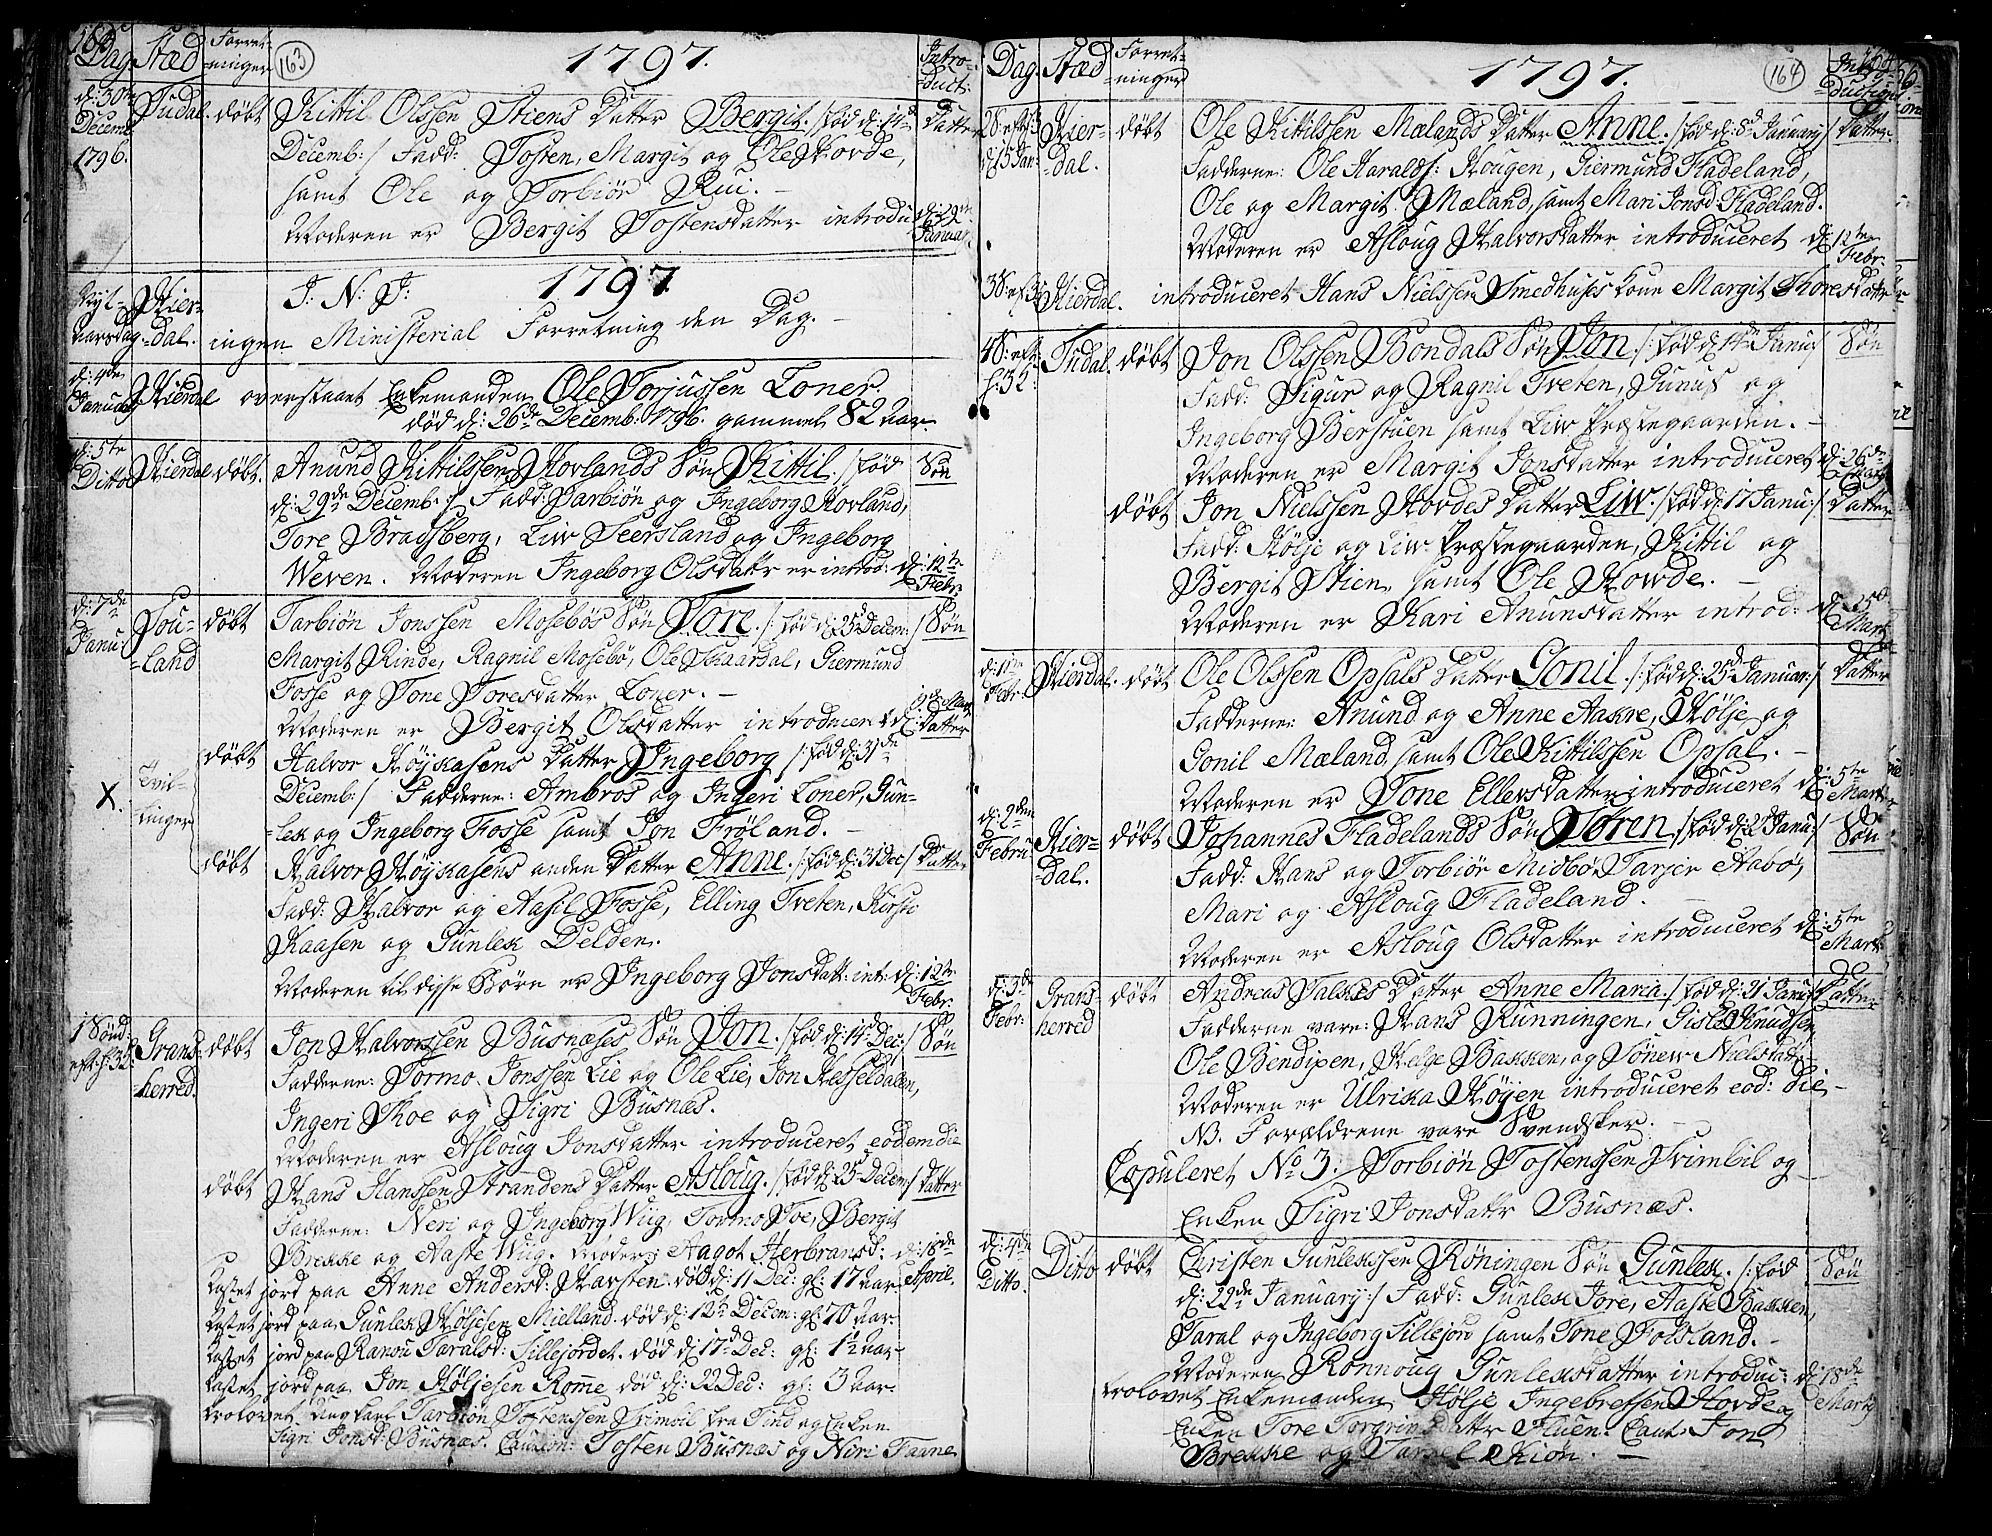 SAKO, Hjartdal kirkebøker, F/Fa/L0005: Ministerialbok nr. I 5, 1776-1801, s. 163-164